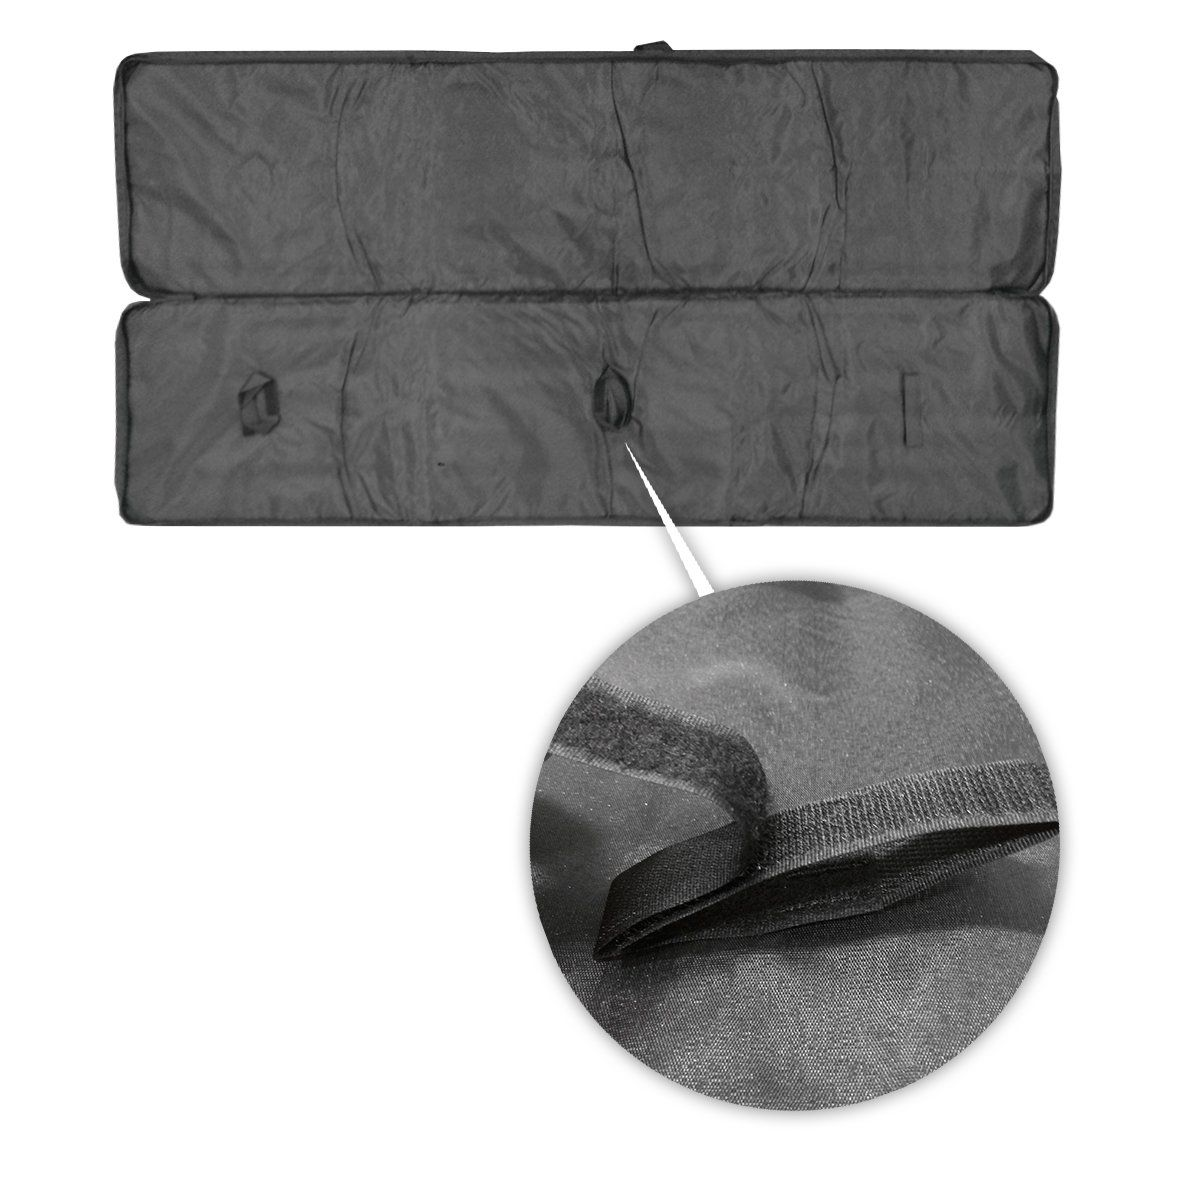 Capa Porta Carabina em Nylon Preto 1,10m Lazer e Aventura